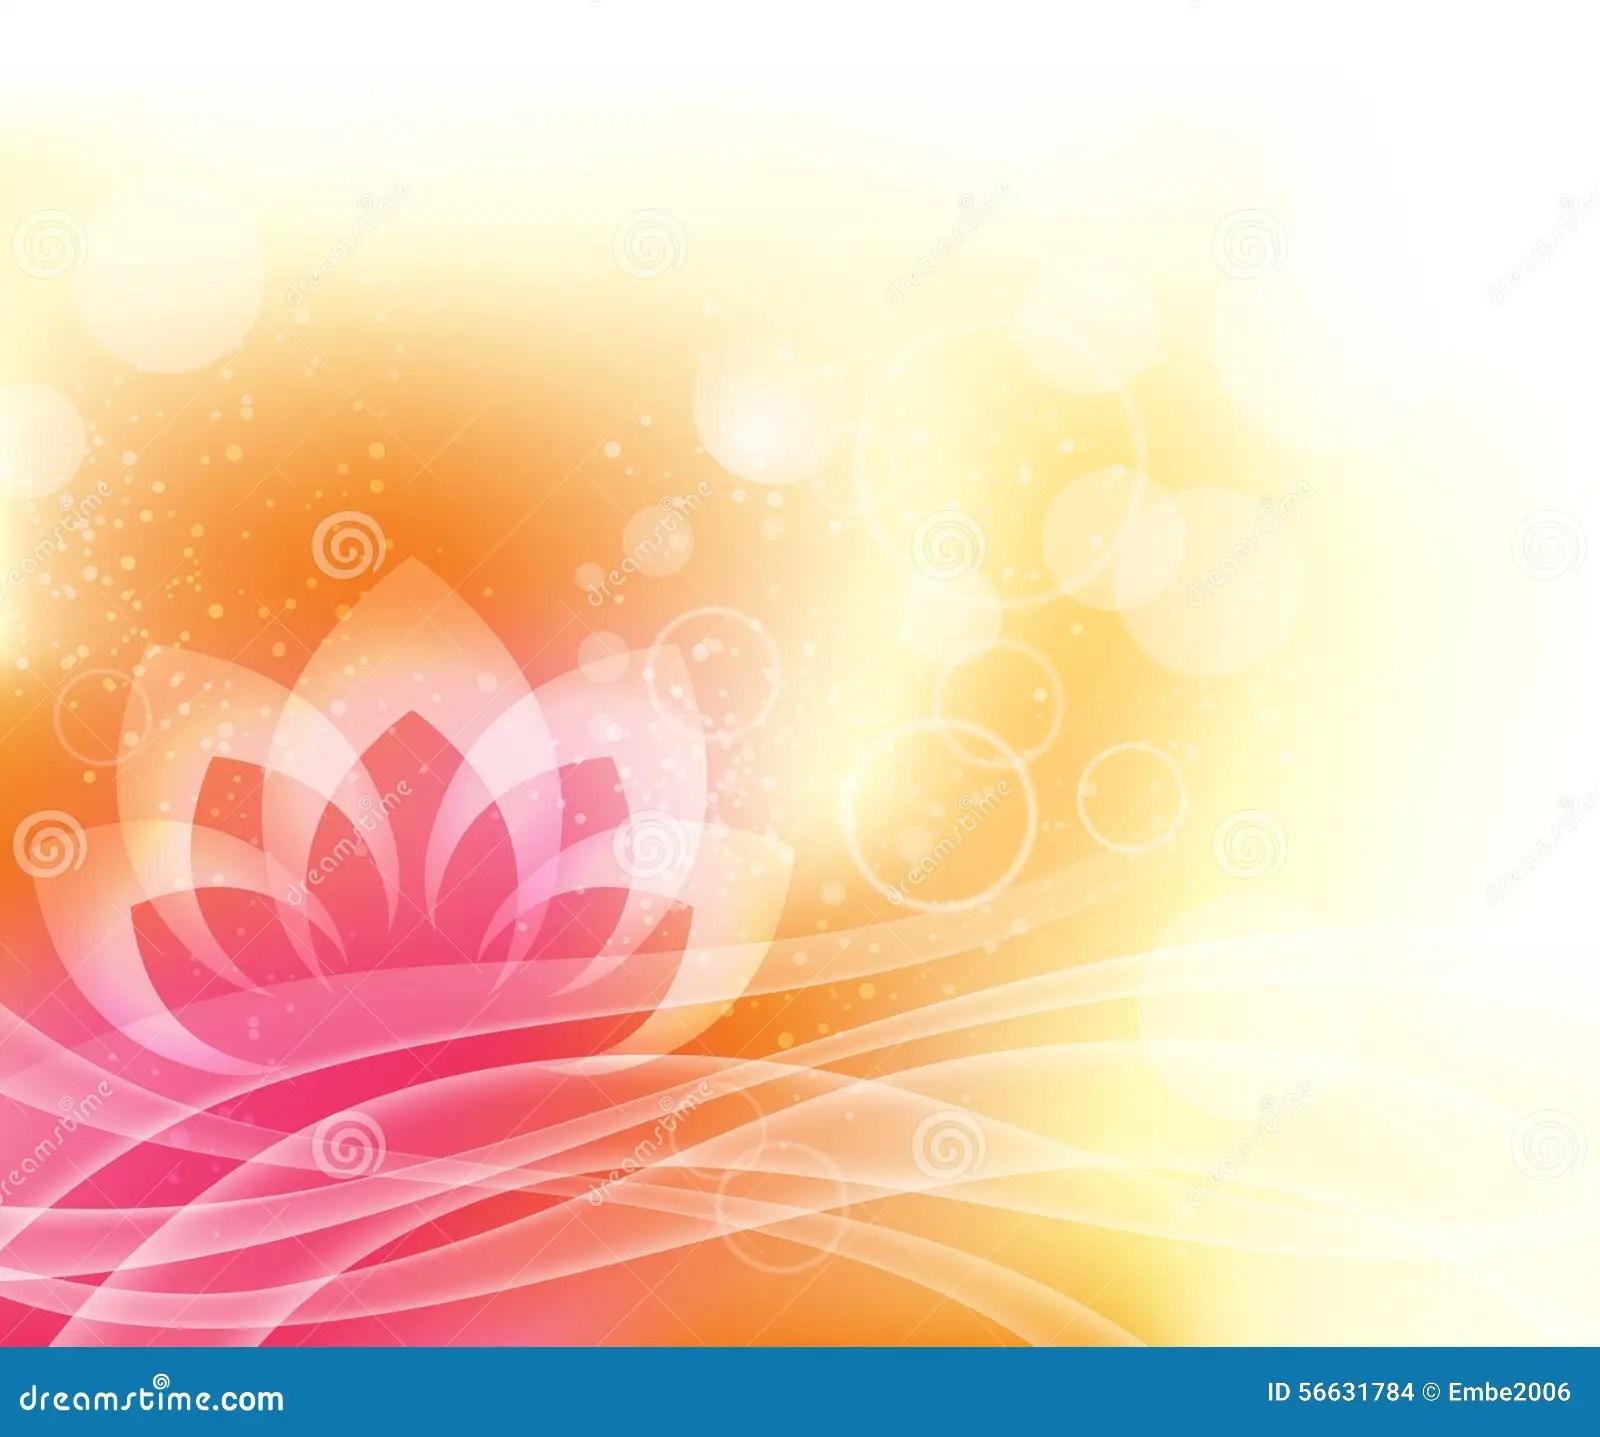 3d Design Flower Wallpaper Lotus Yoga Background Stock Photo Image 56631784